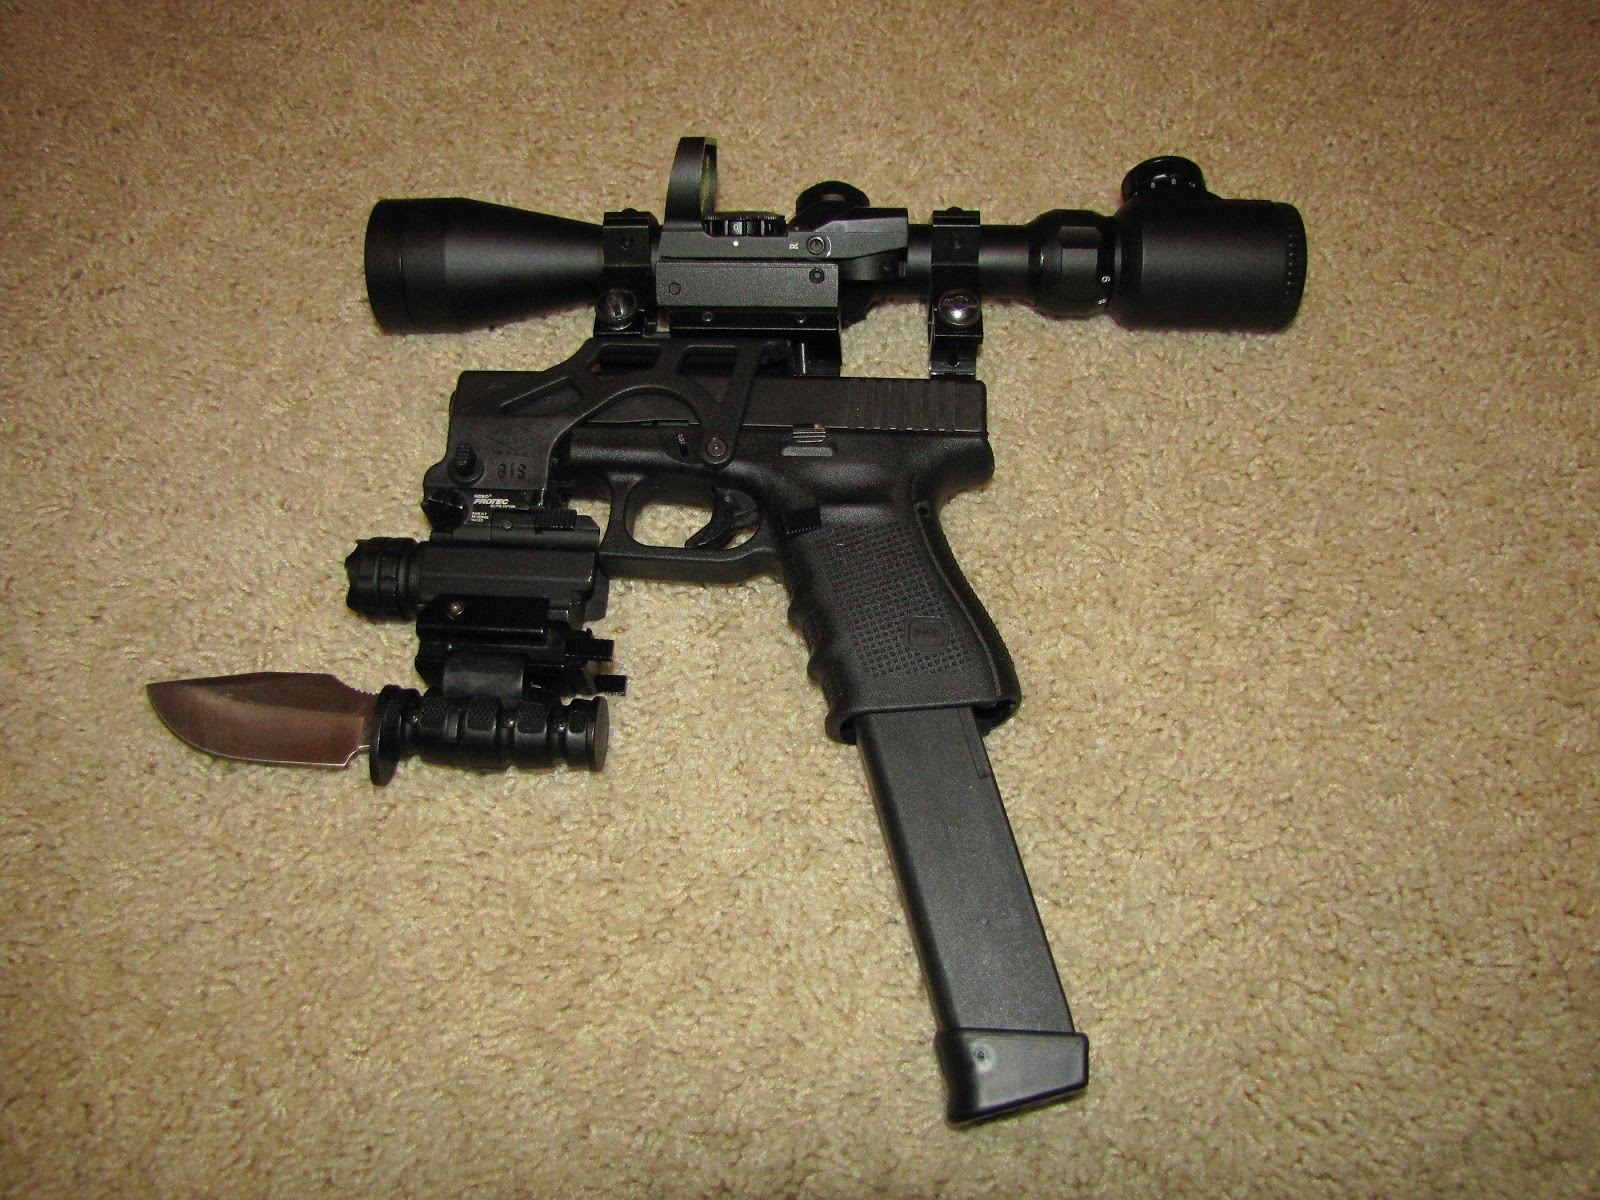 Snafu Never Use Gun Mods For Self Defense Duty Ey